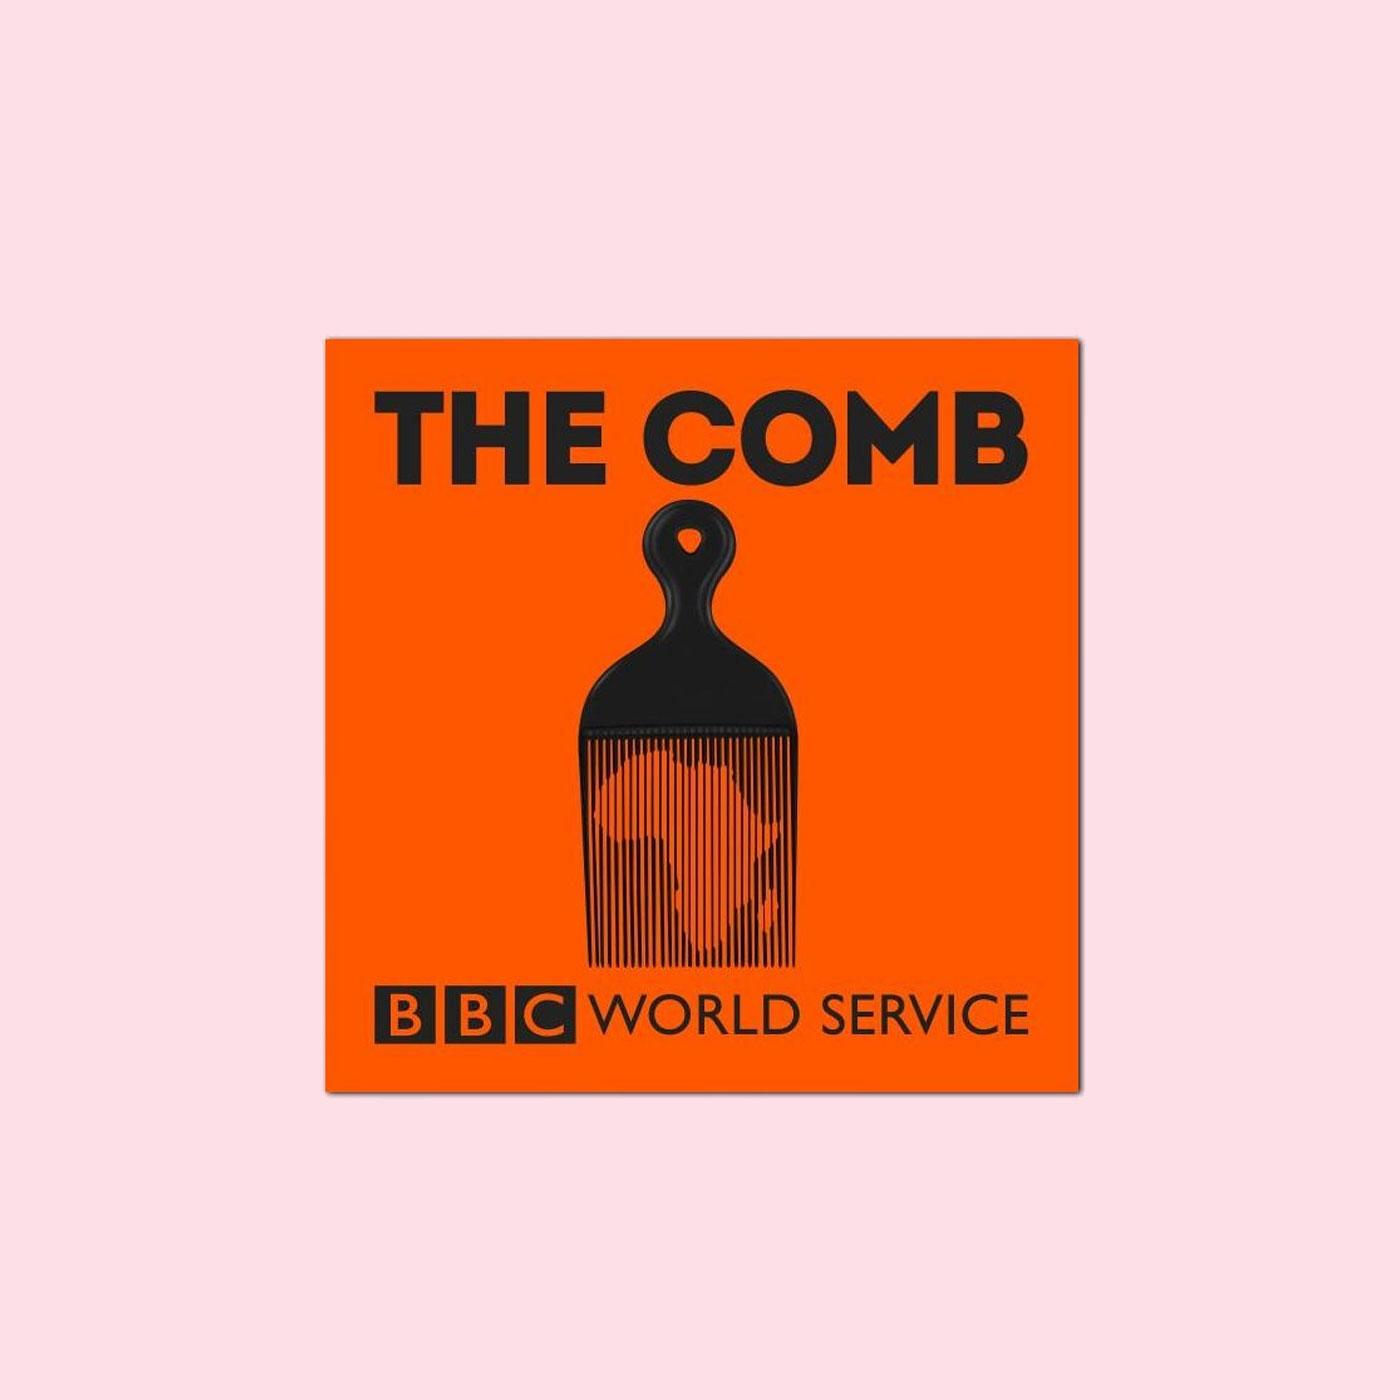 The Comb